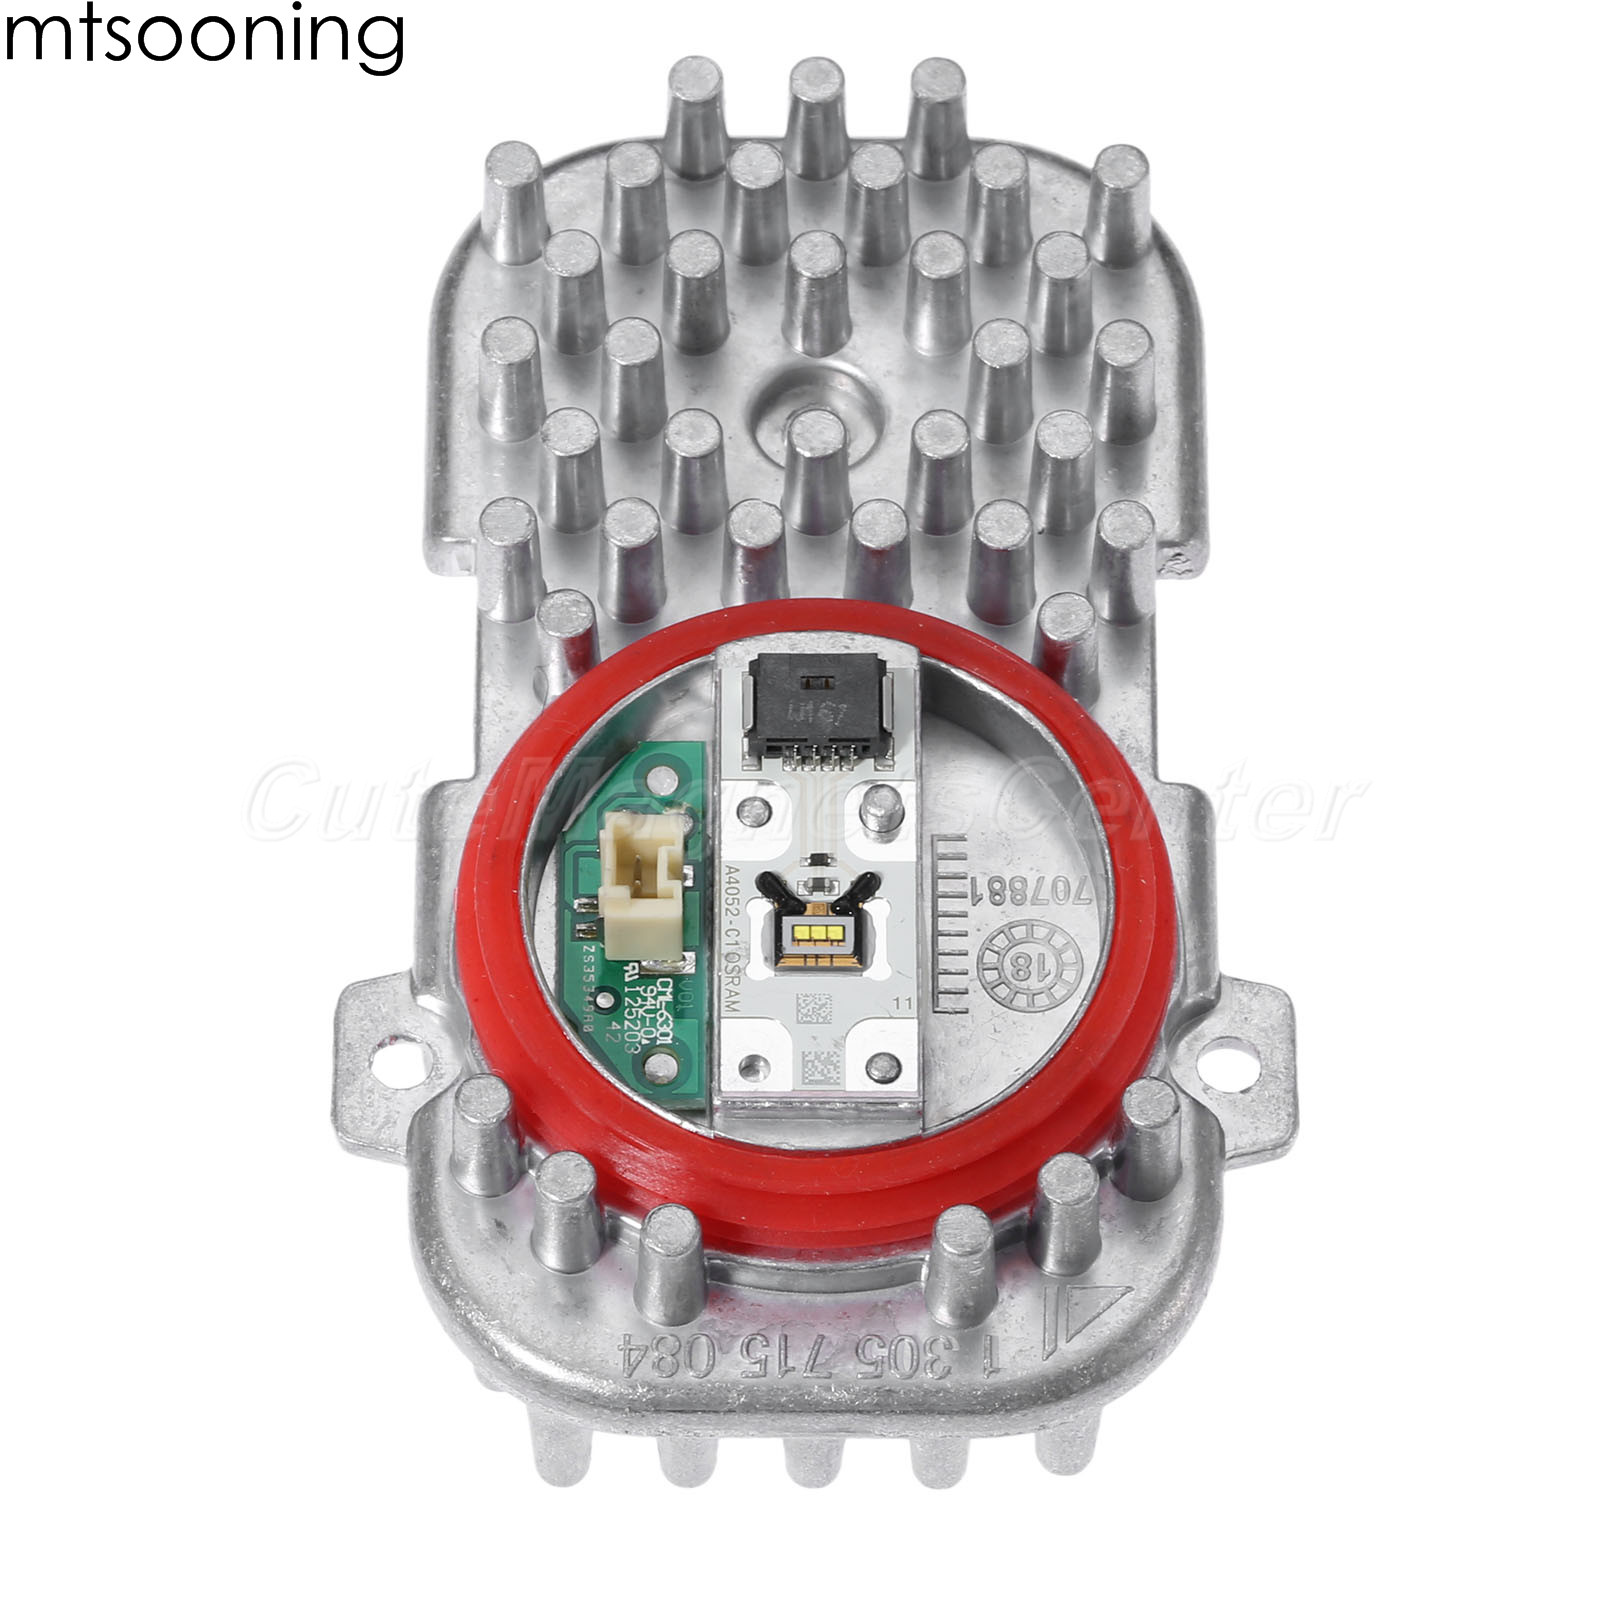 Mtsooning phare Led Insert Diode modèle 63117263051 pour BMW 328i 335i 428i 430i 440i A/T X3 X5 X6